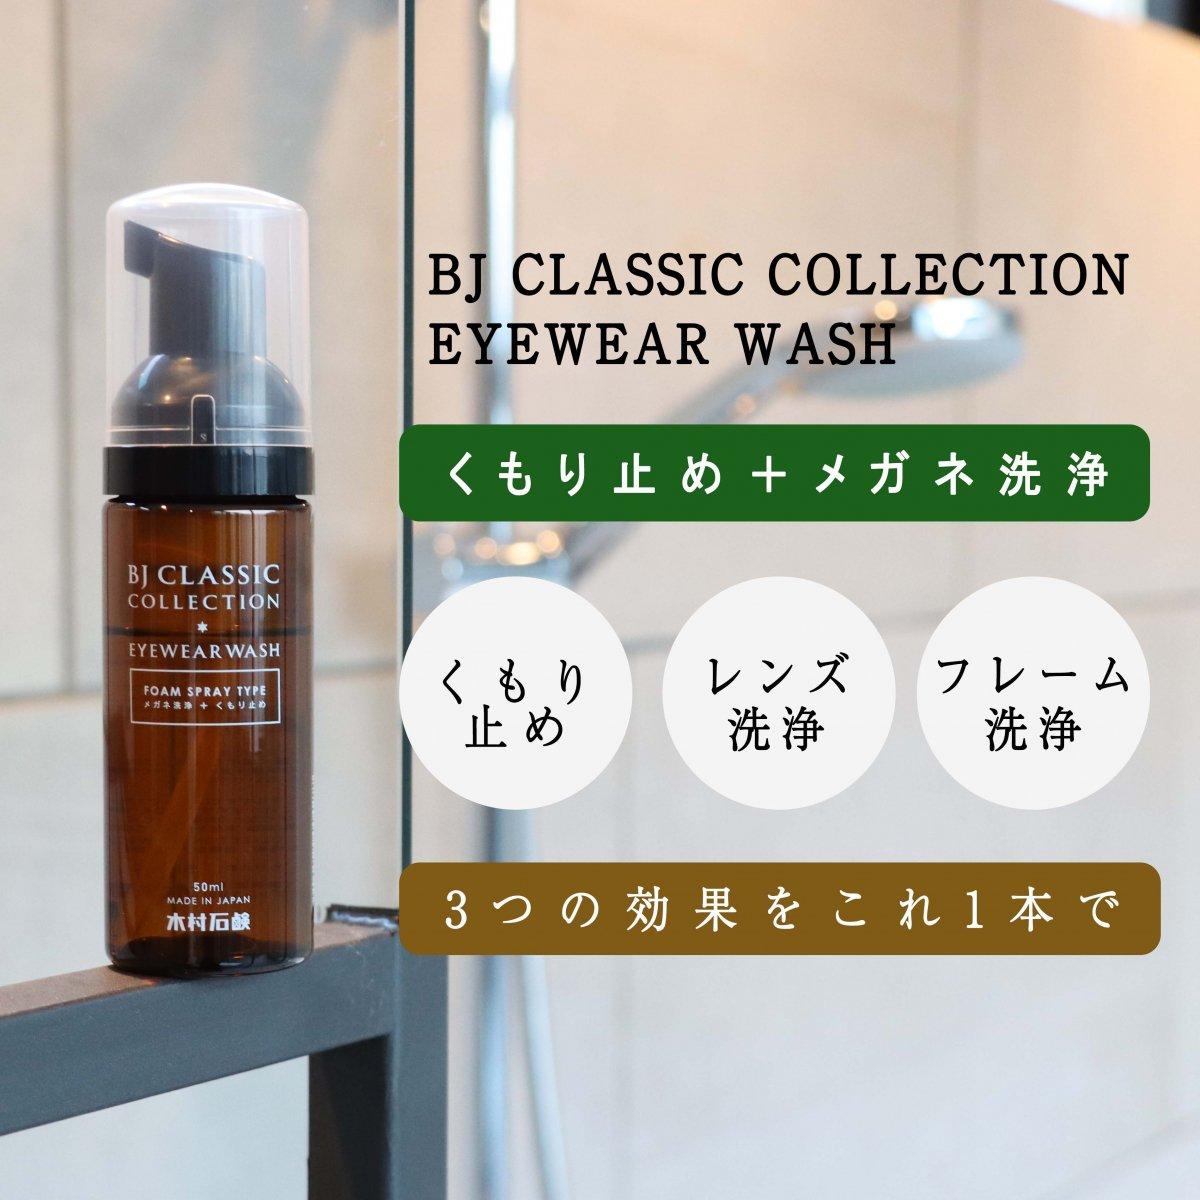 BJ CLASSIC COLLECTION EYEWEAR WASH 50ml 詳細画像2